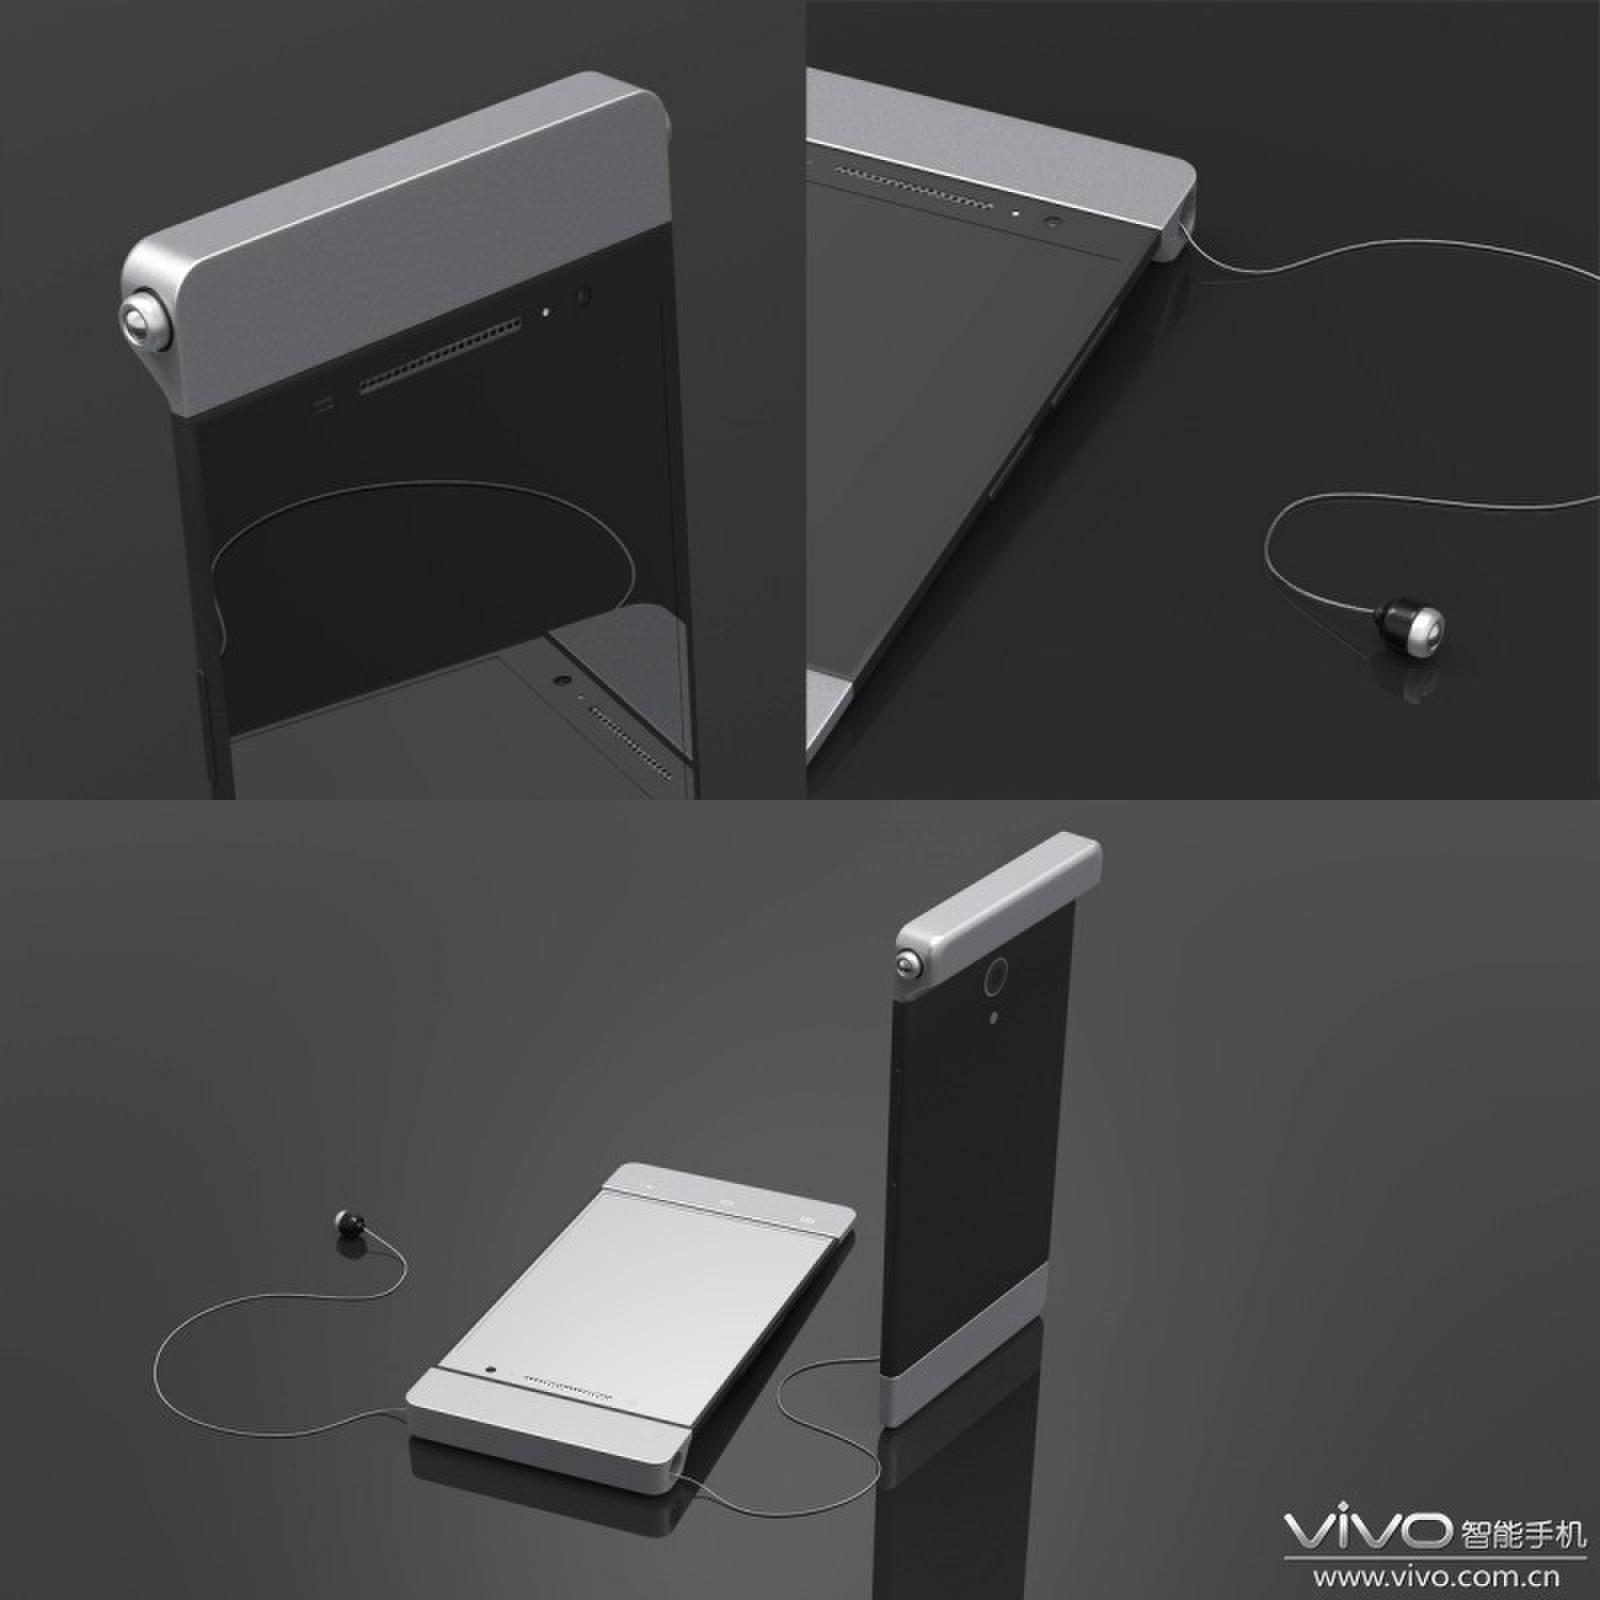 vivo Xplay3S欲打造全球首款集成多音频解决方案概念机